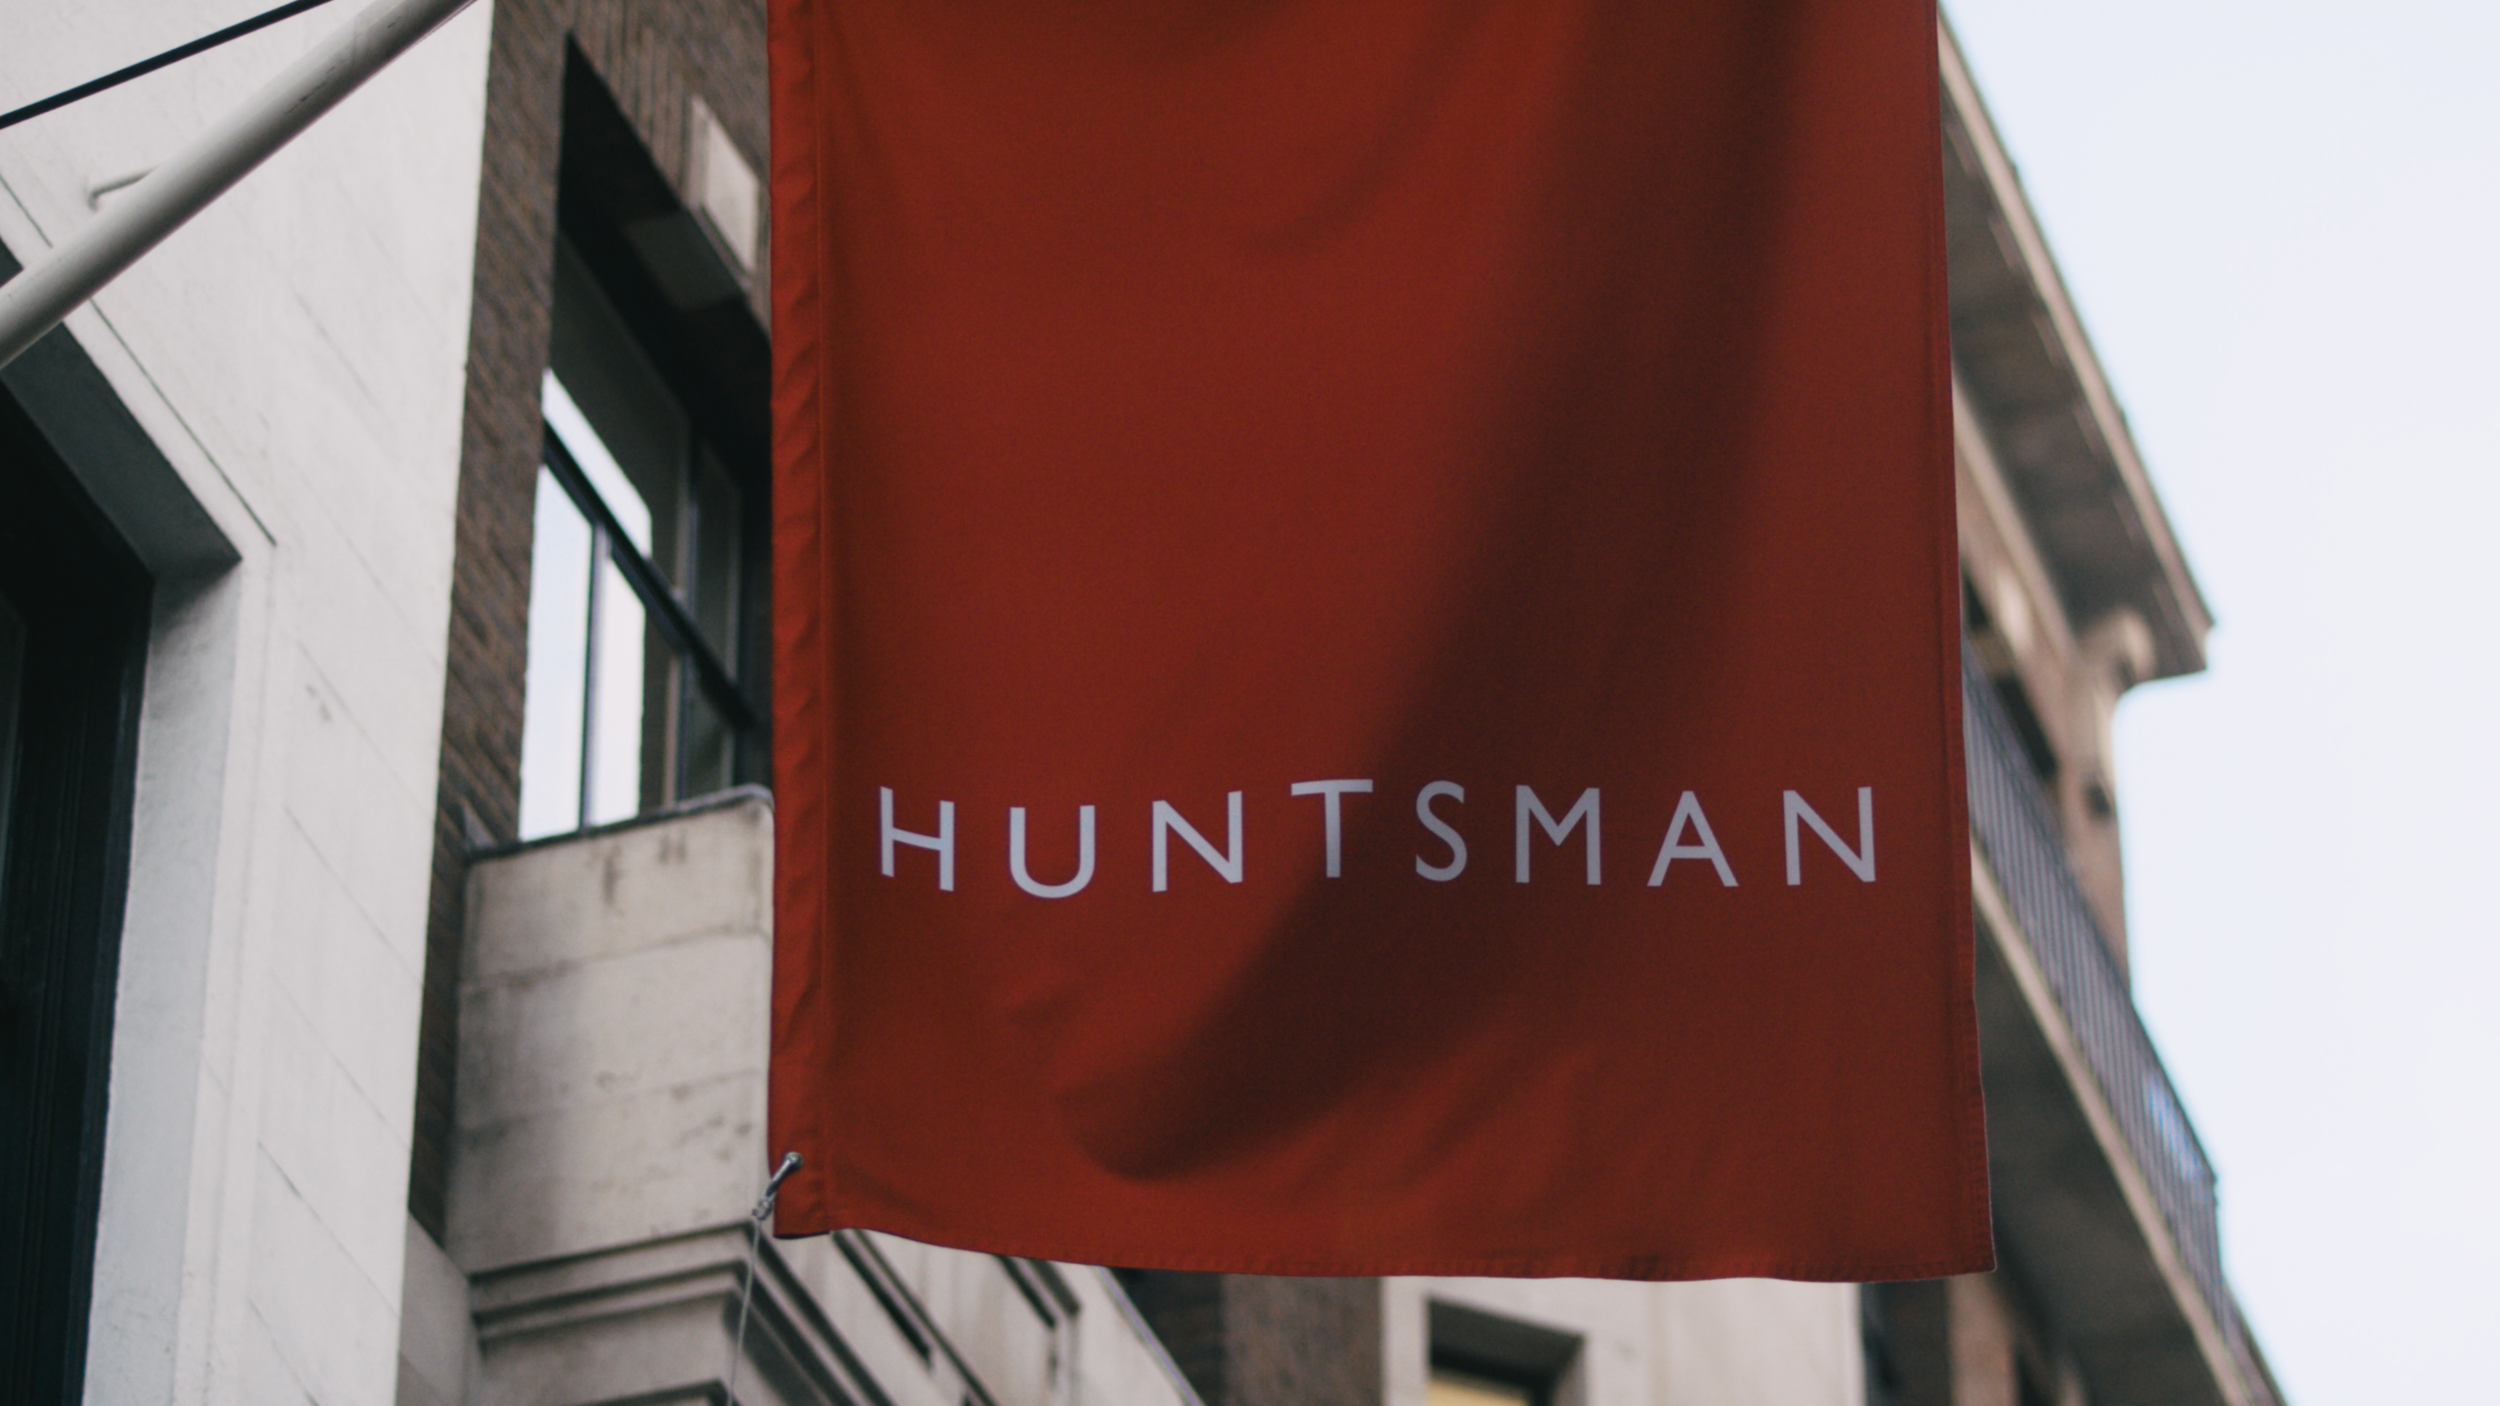 HUNTSMAN_06.png